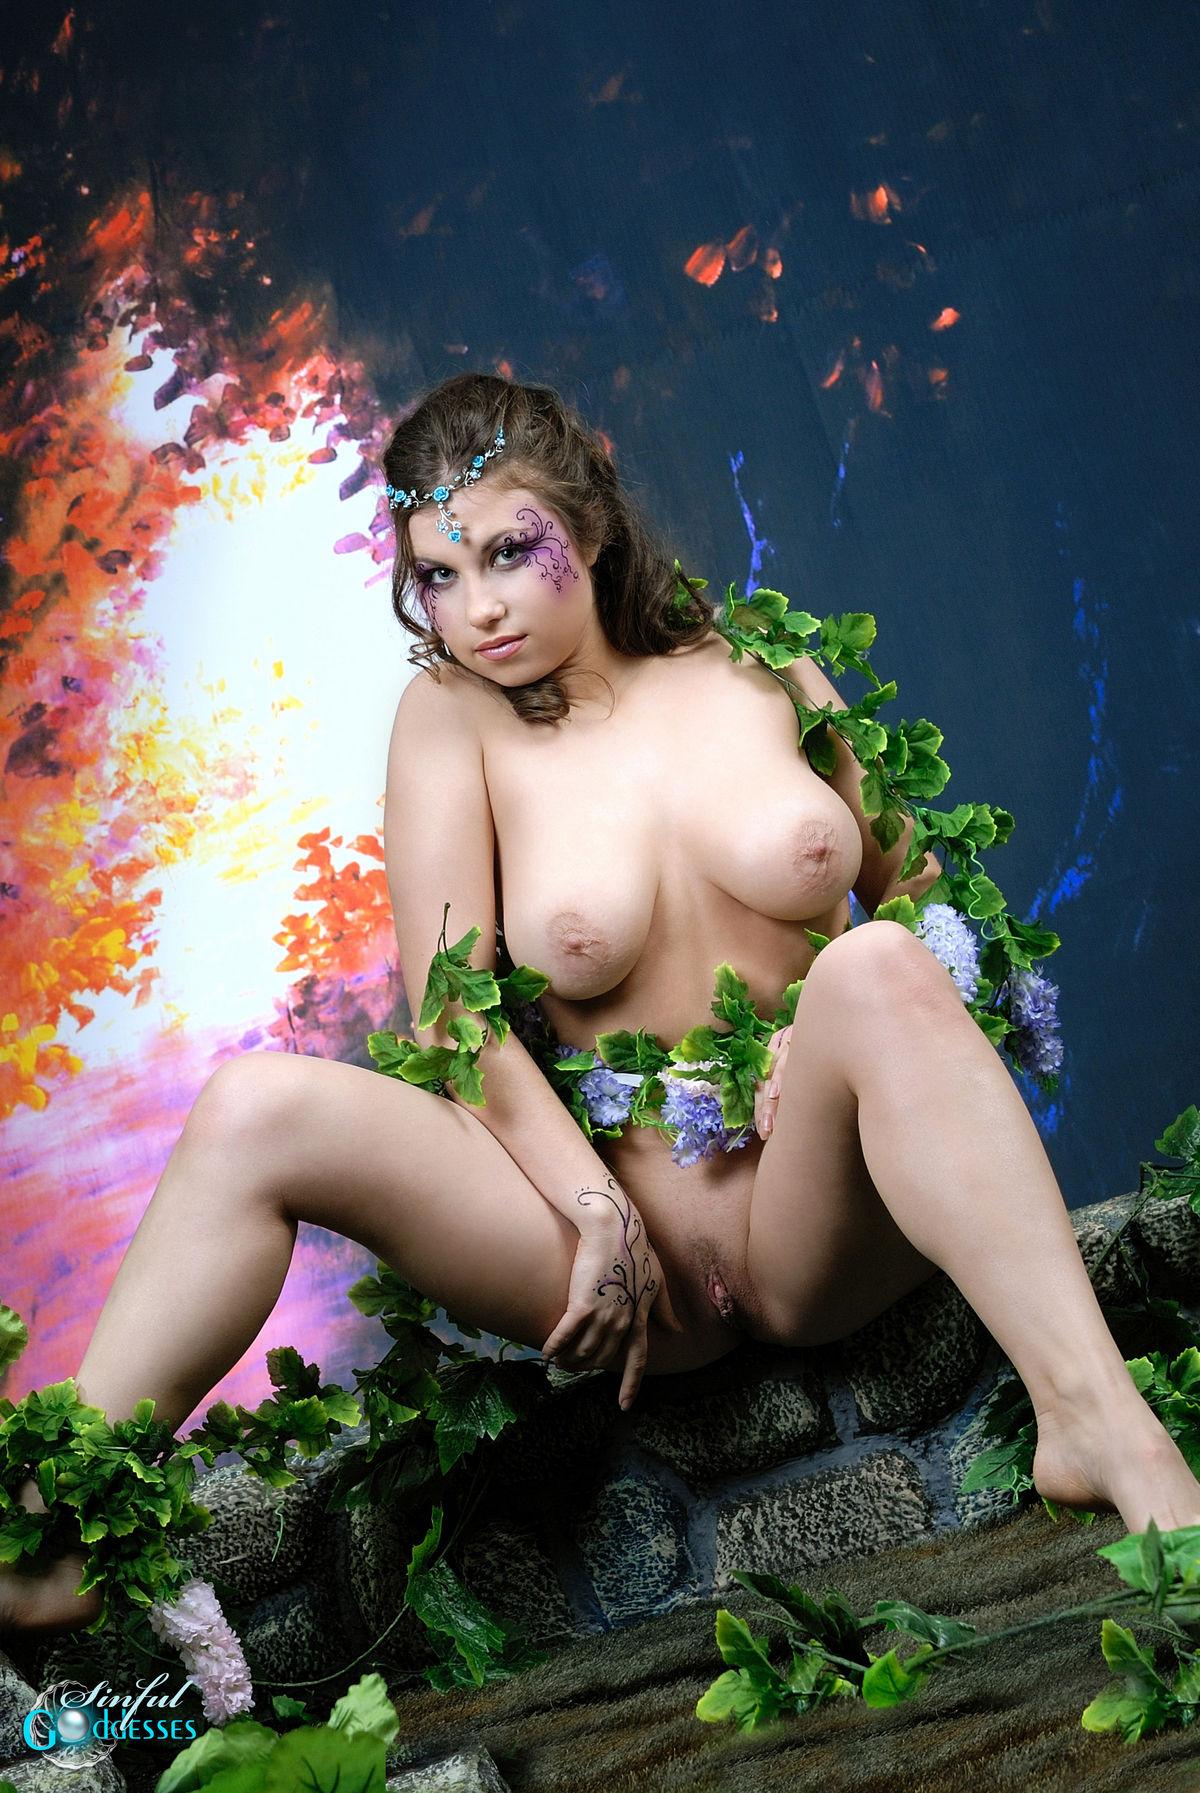 Sinful goddesses nude